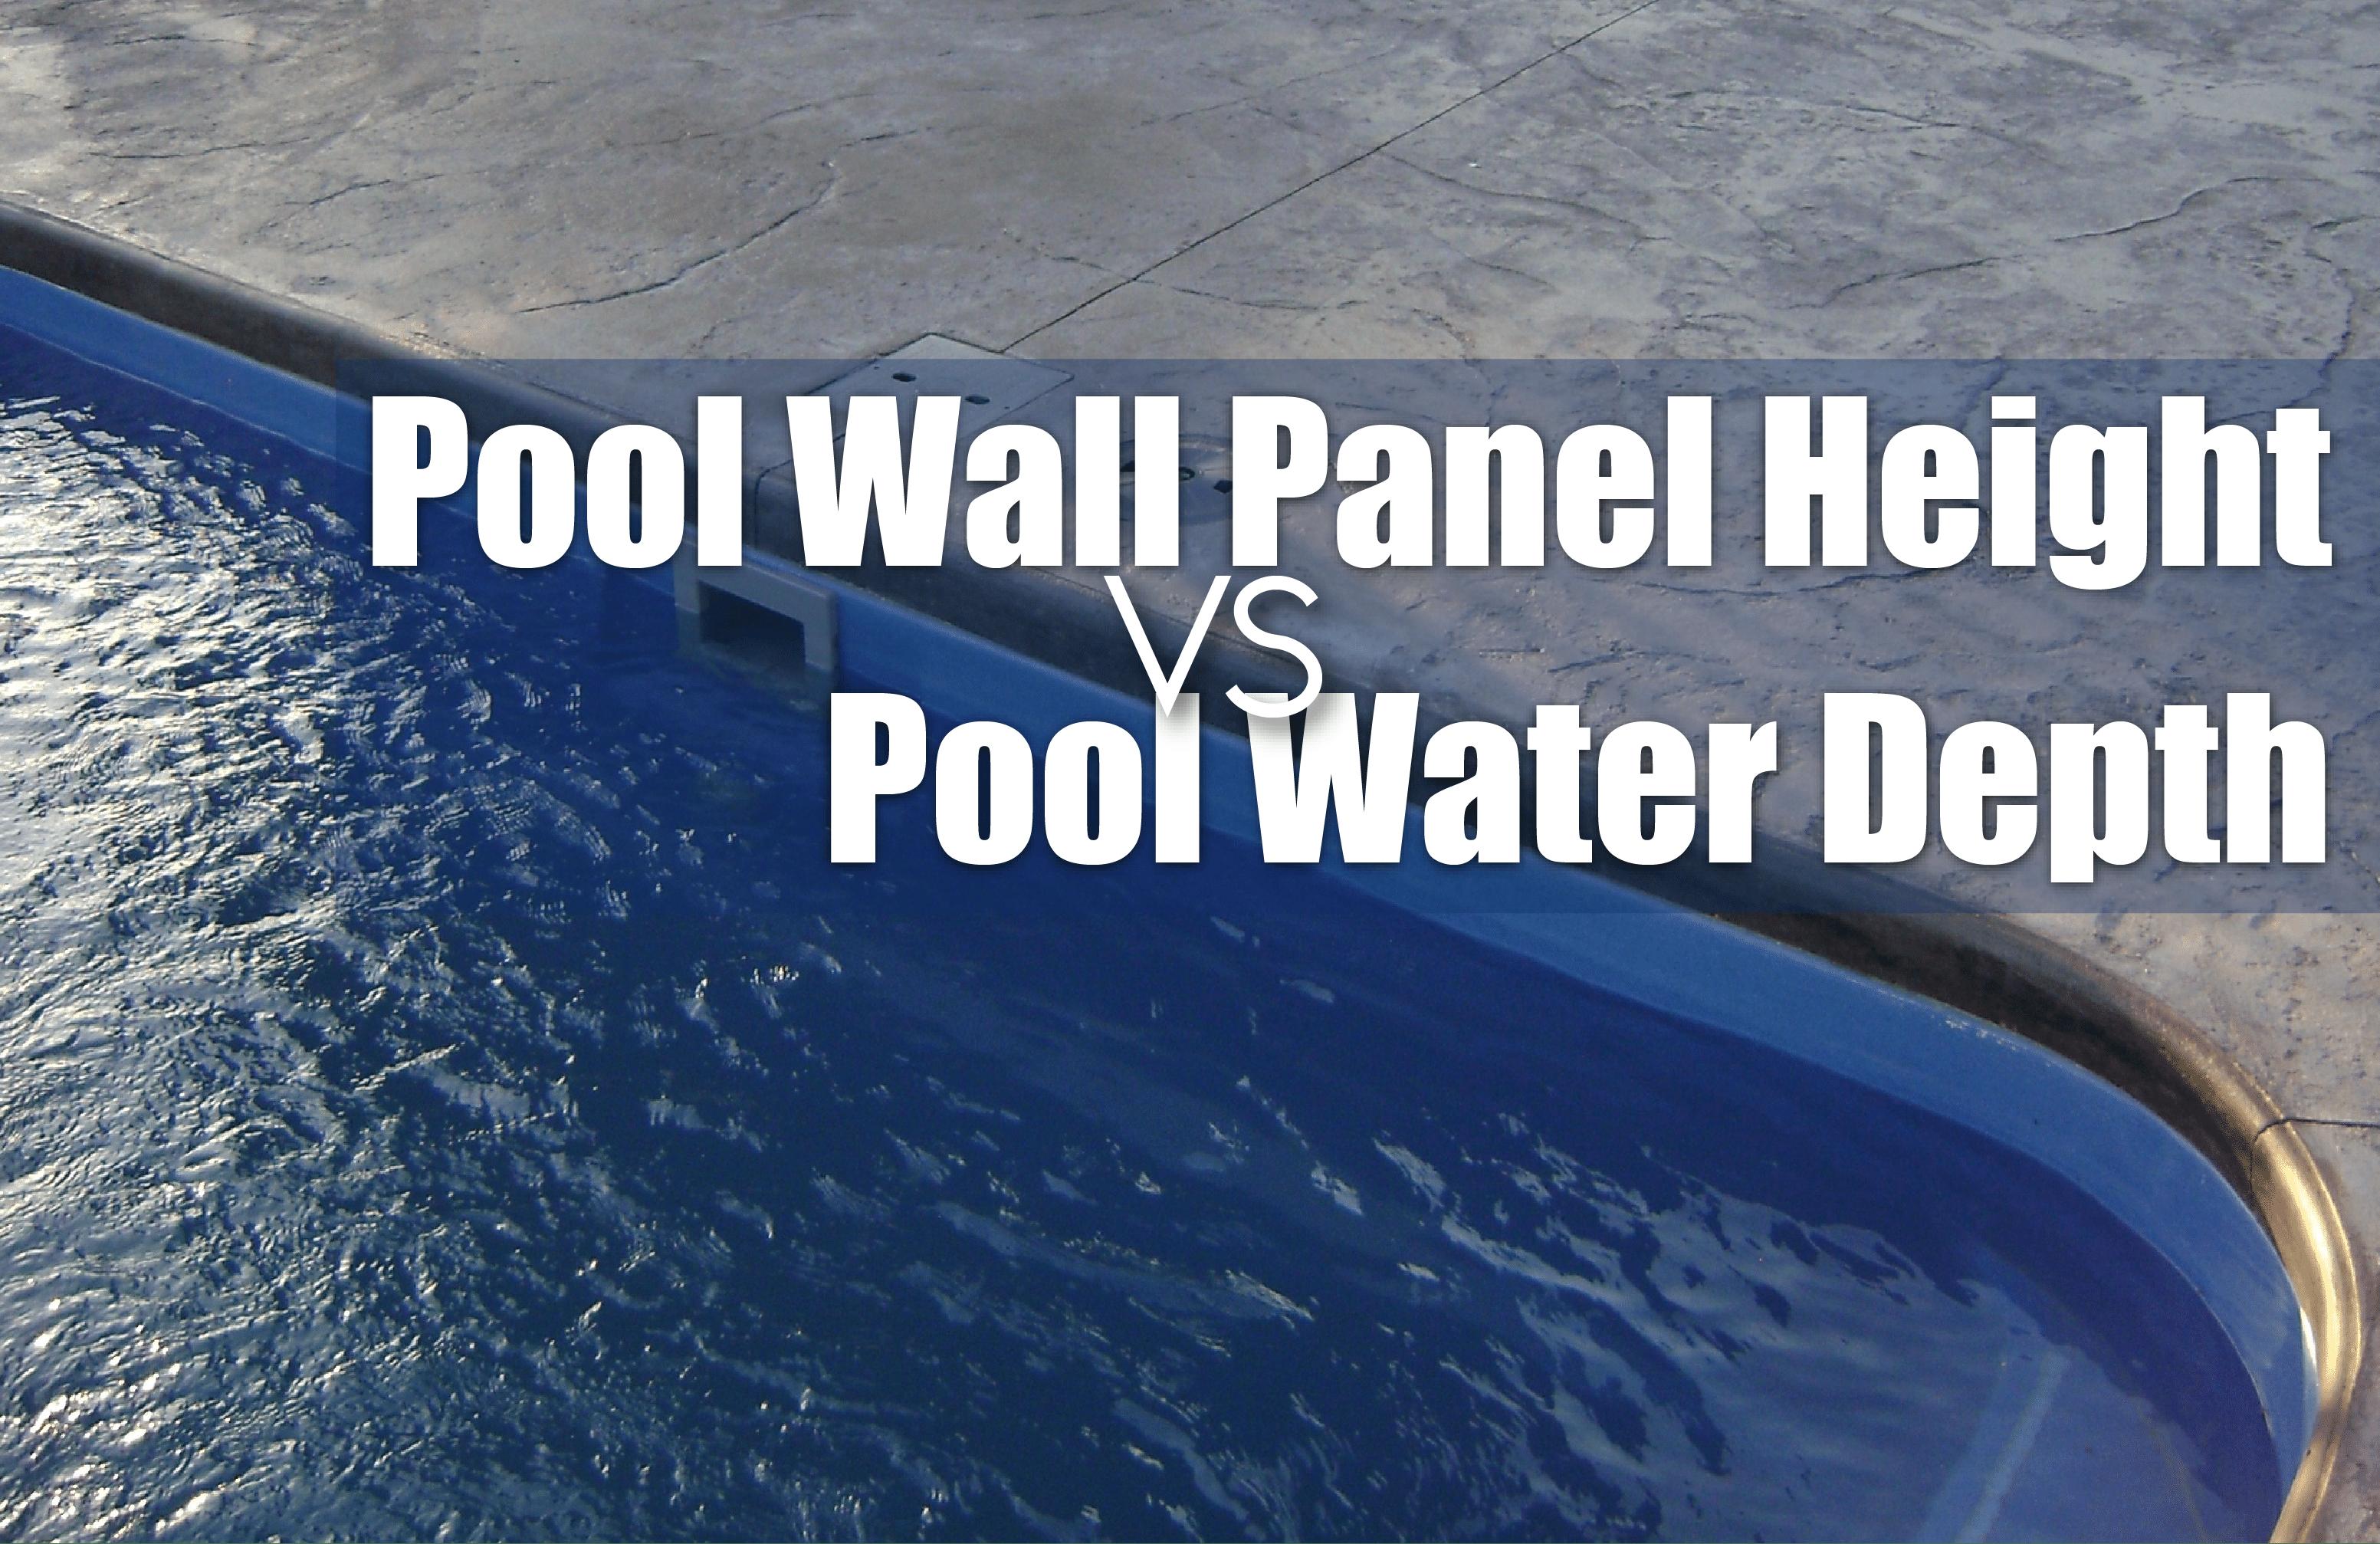 Pool Wall Panel Height Vs Pool Water Depth - Pool Warehouse